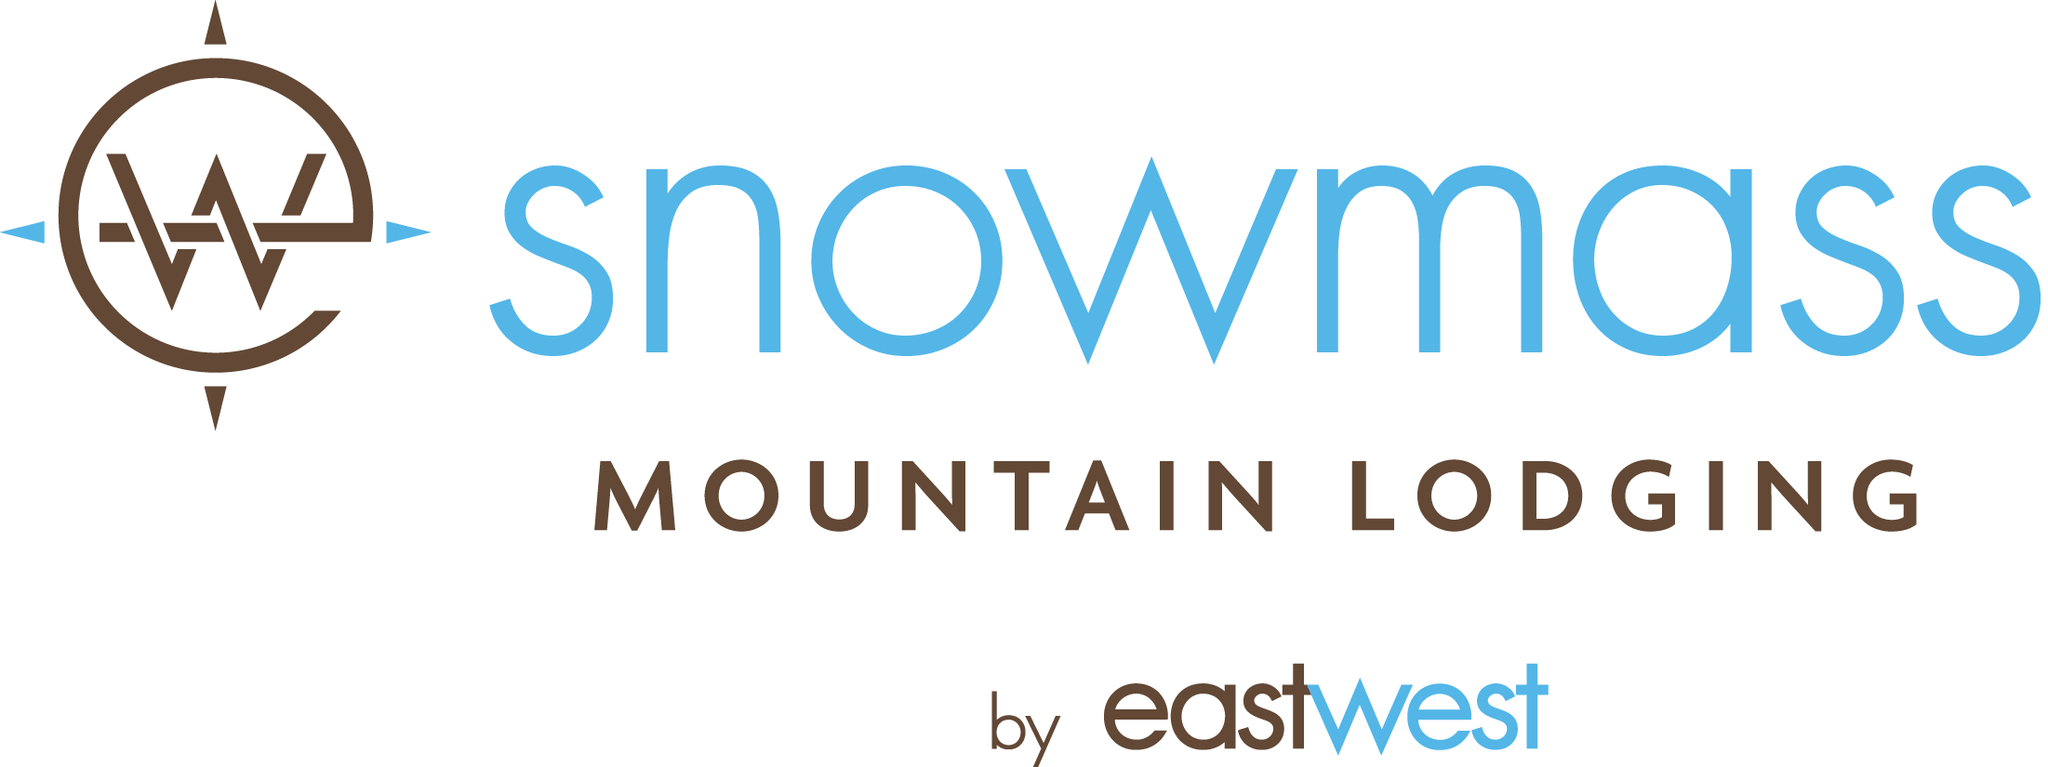 Snowmass Mountain Lodging's Logo